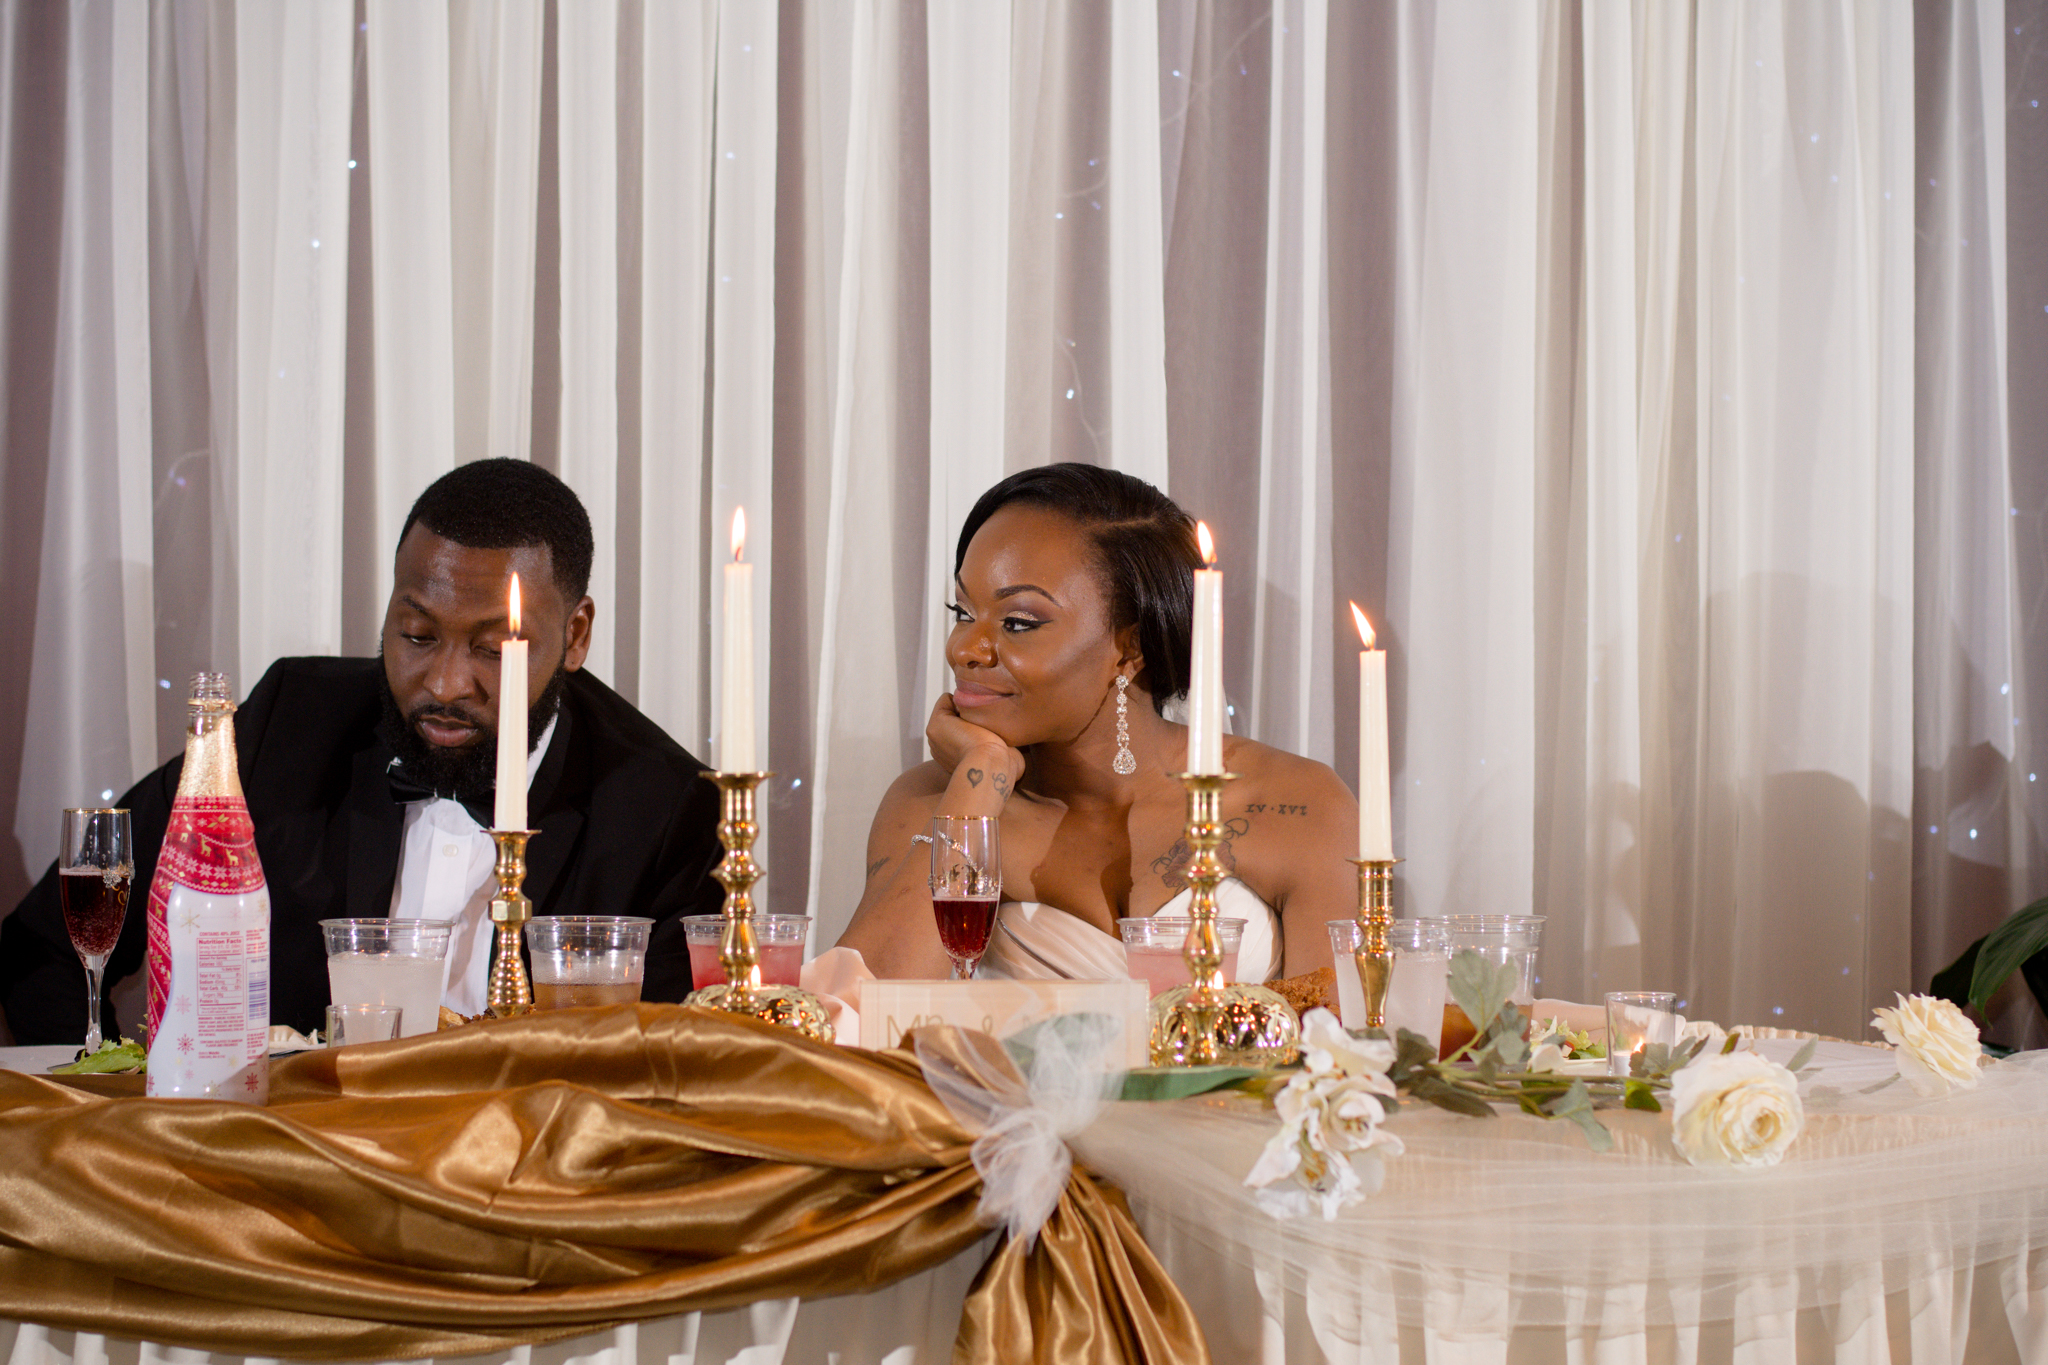 chaplin wedding (160 of 181).JPG